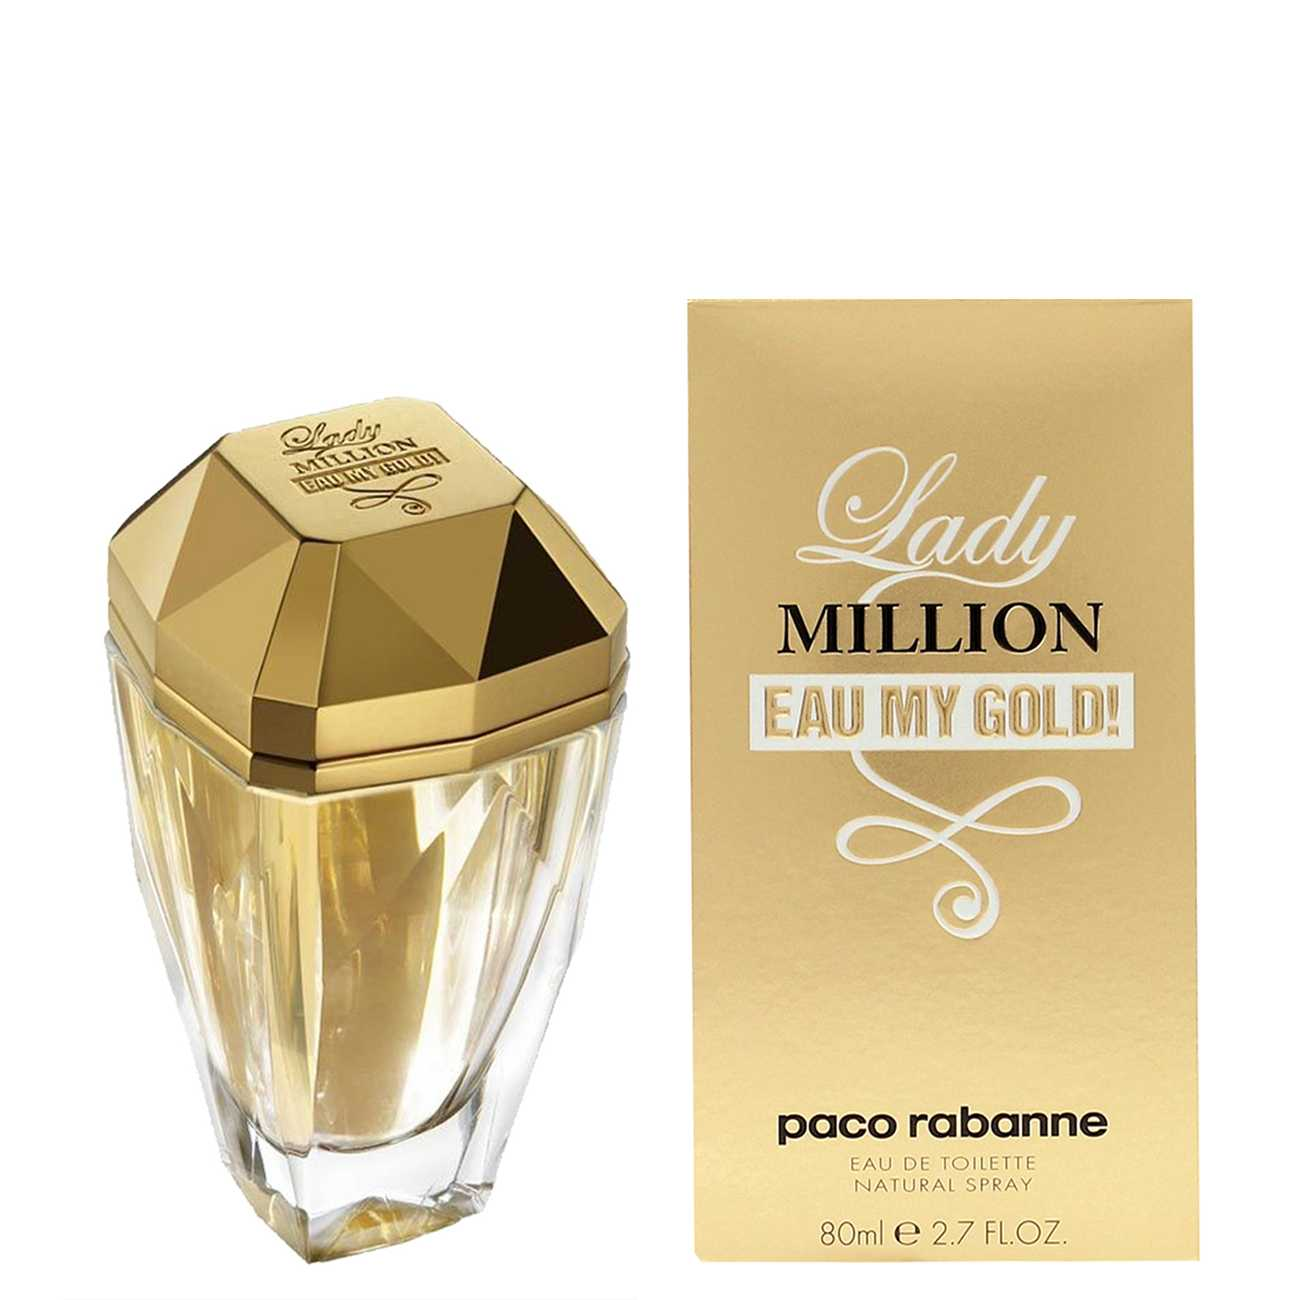 LADY MILLION L'EAU MY GOLD 80ml